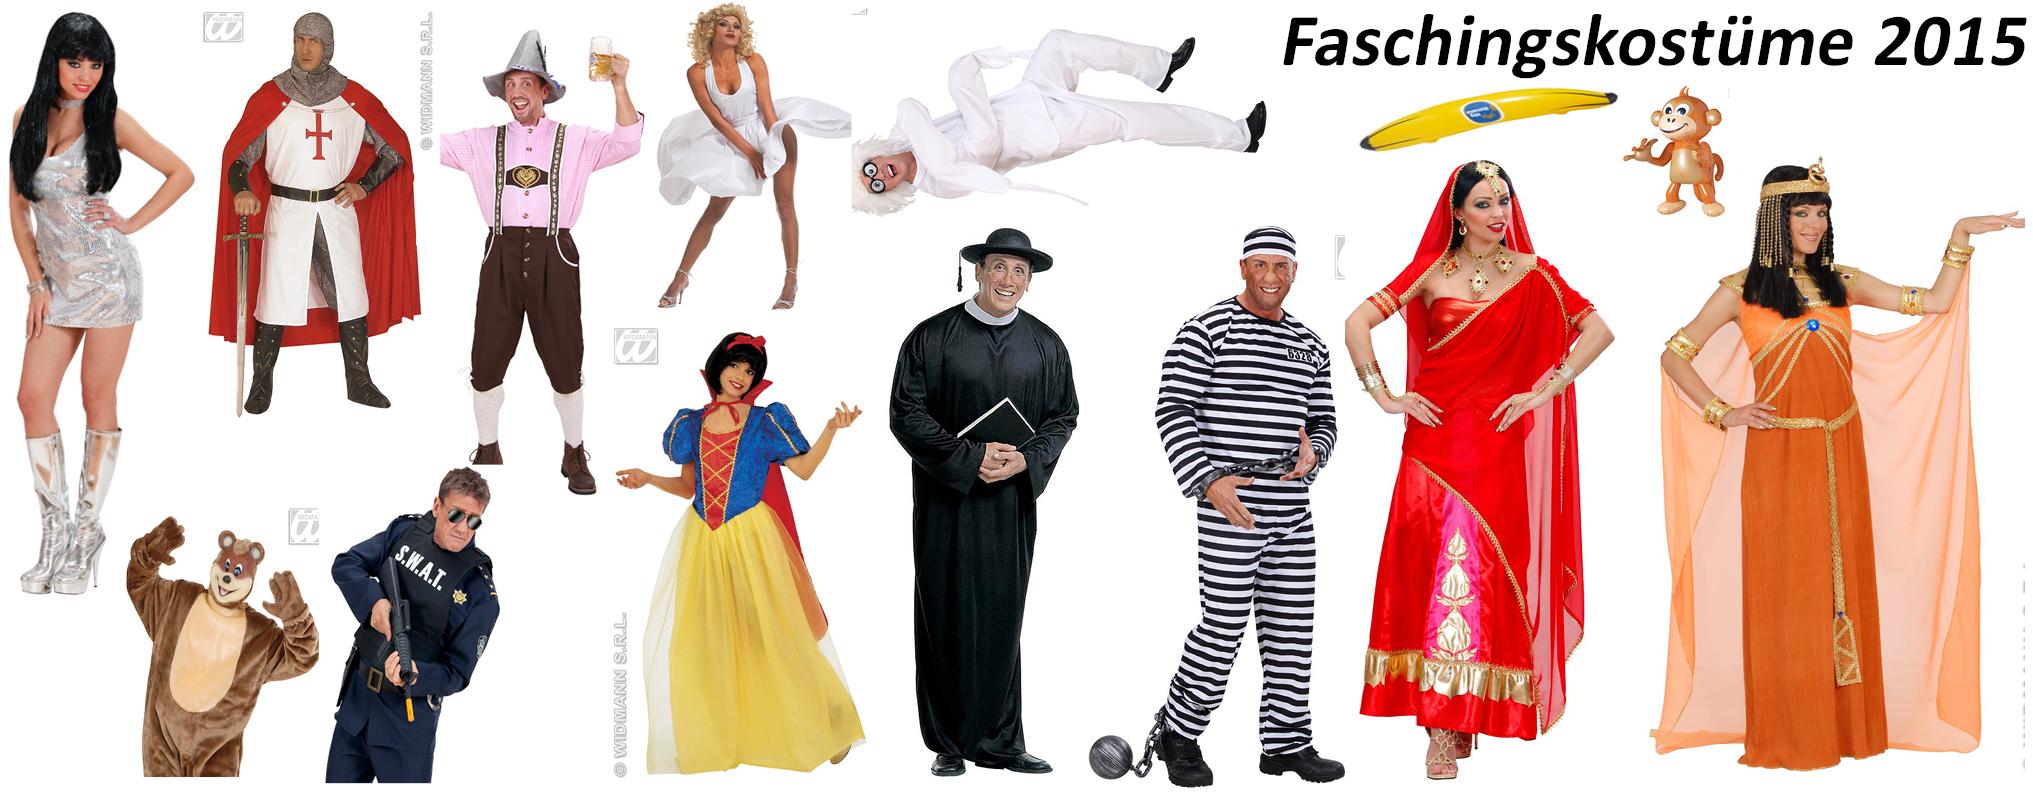 Banner Faschingskost�me 2015